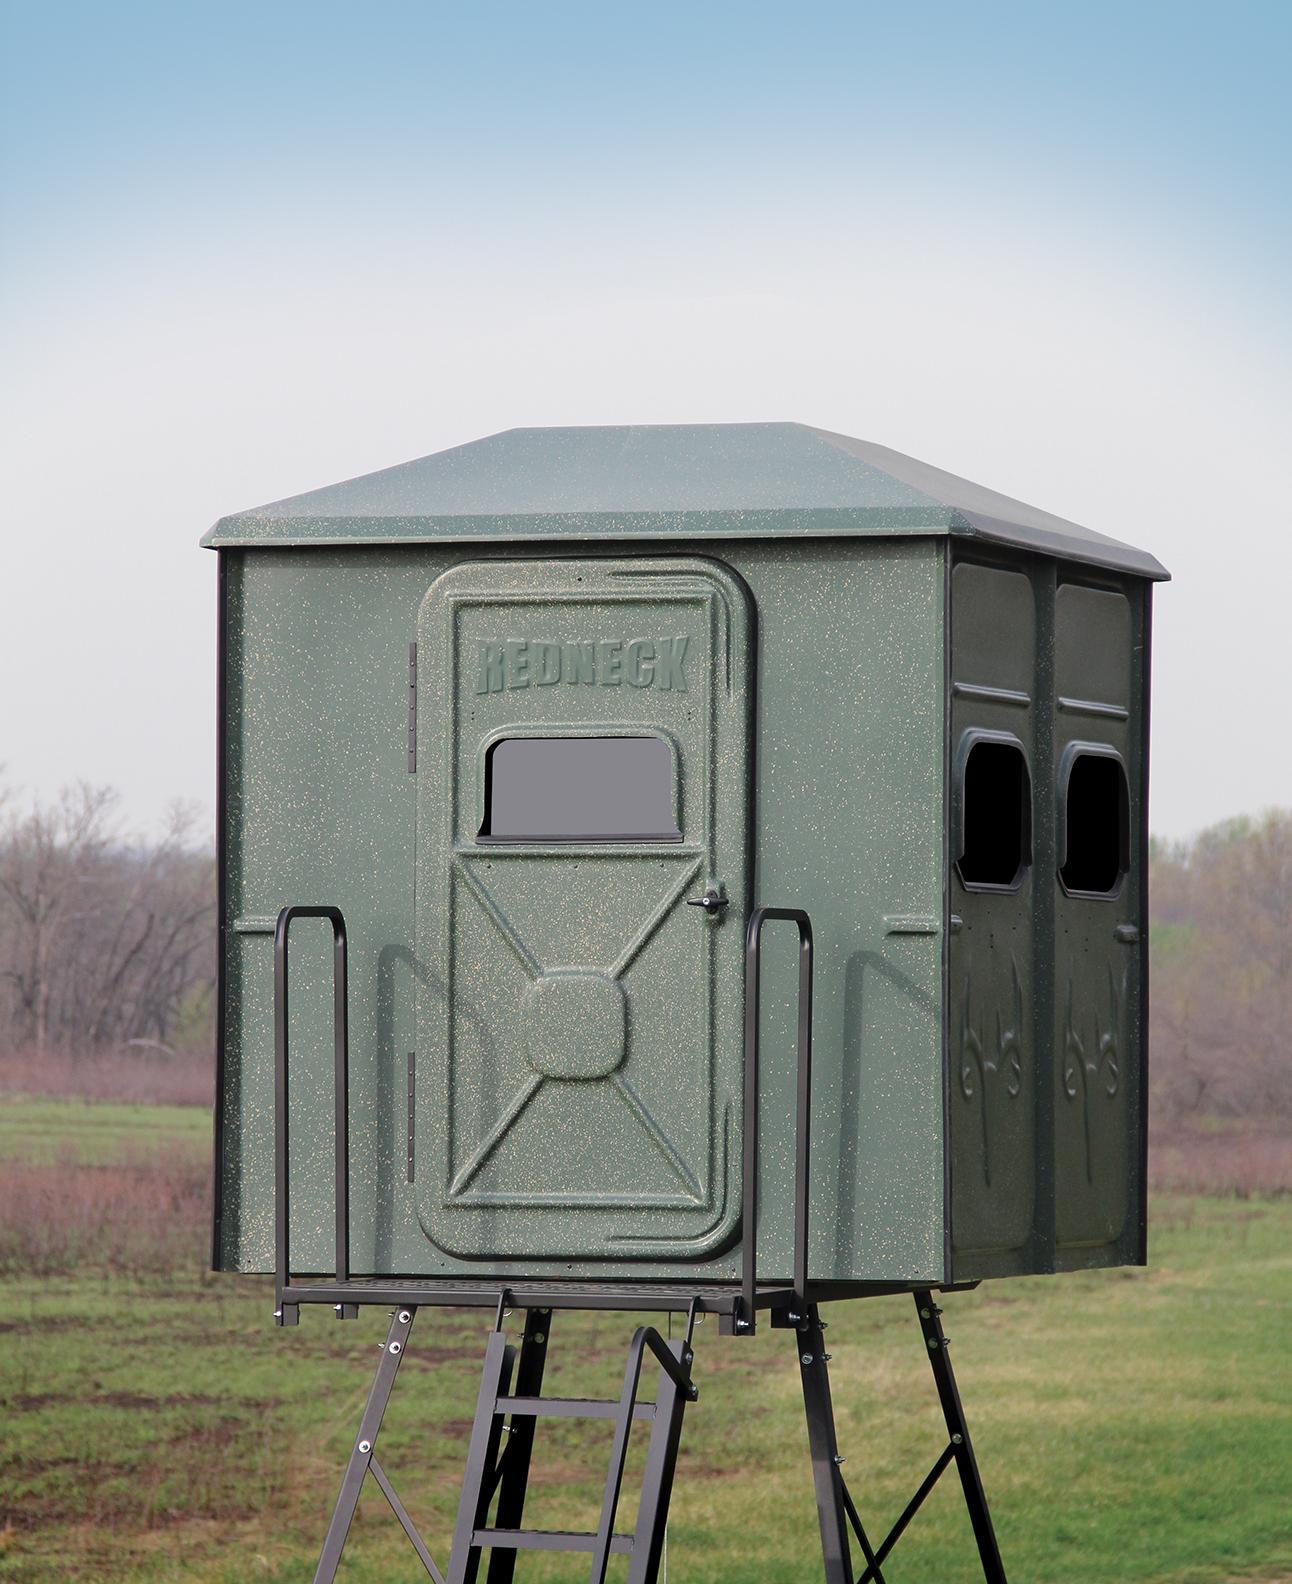 Redneck Outdoors Adds Redneck Magnum 6x6 Blind To Line Up